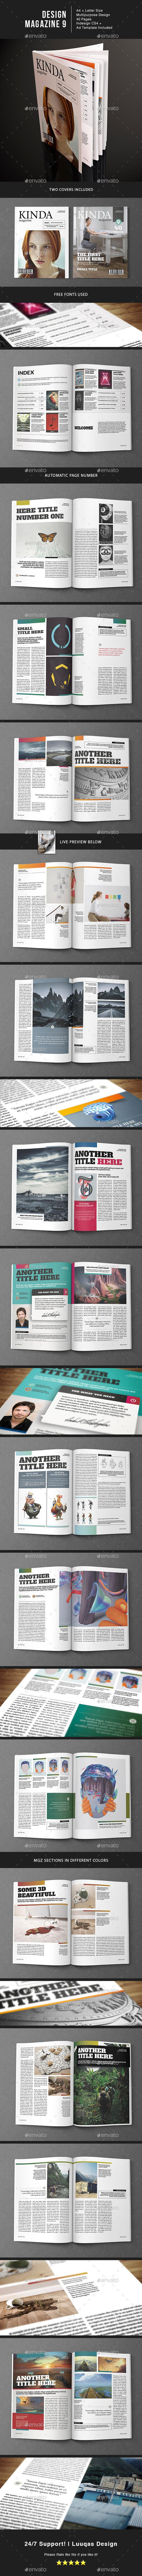 Kinda Magazine Indesign Template - Magazines Print Templates